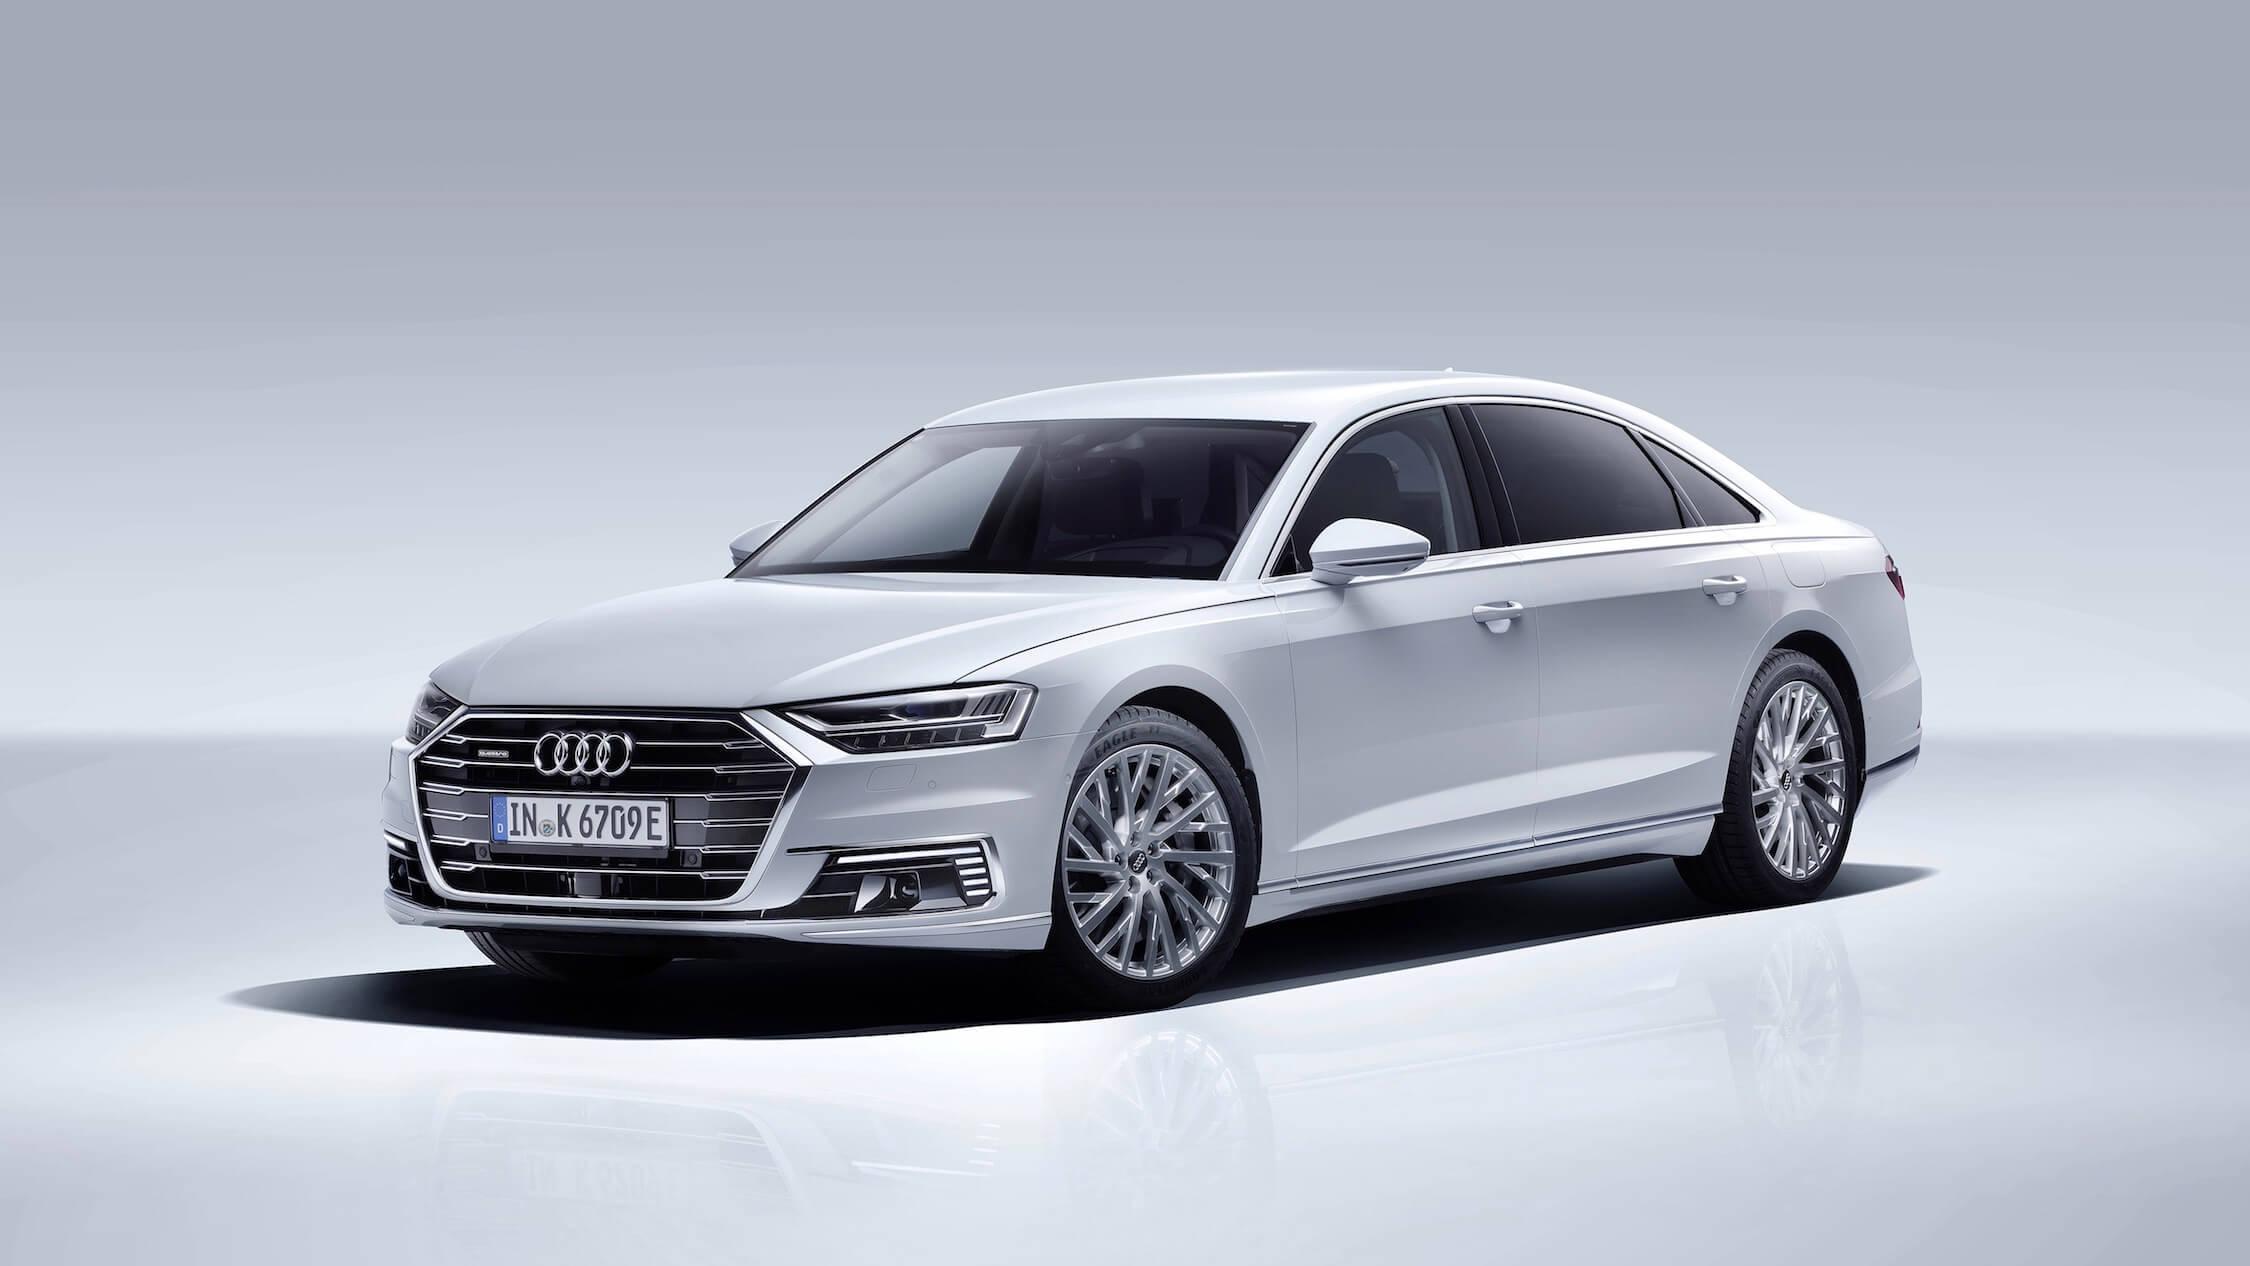 Audi A8 L 60 TFSI-e